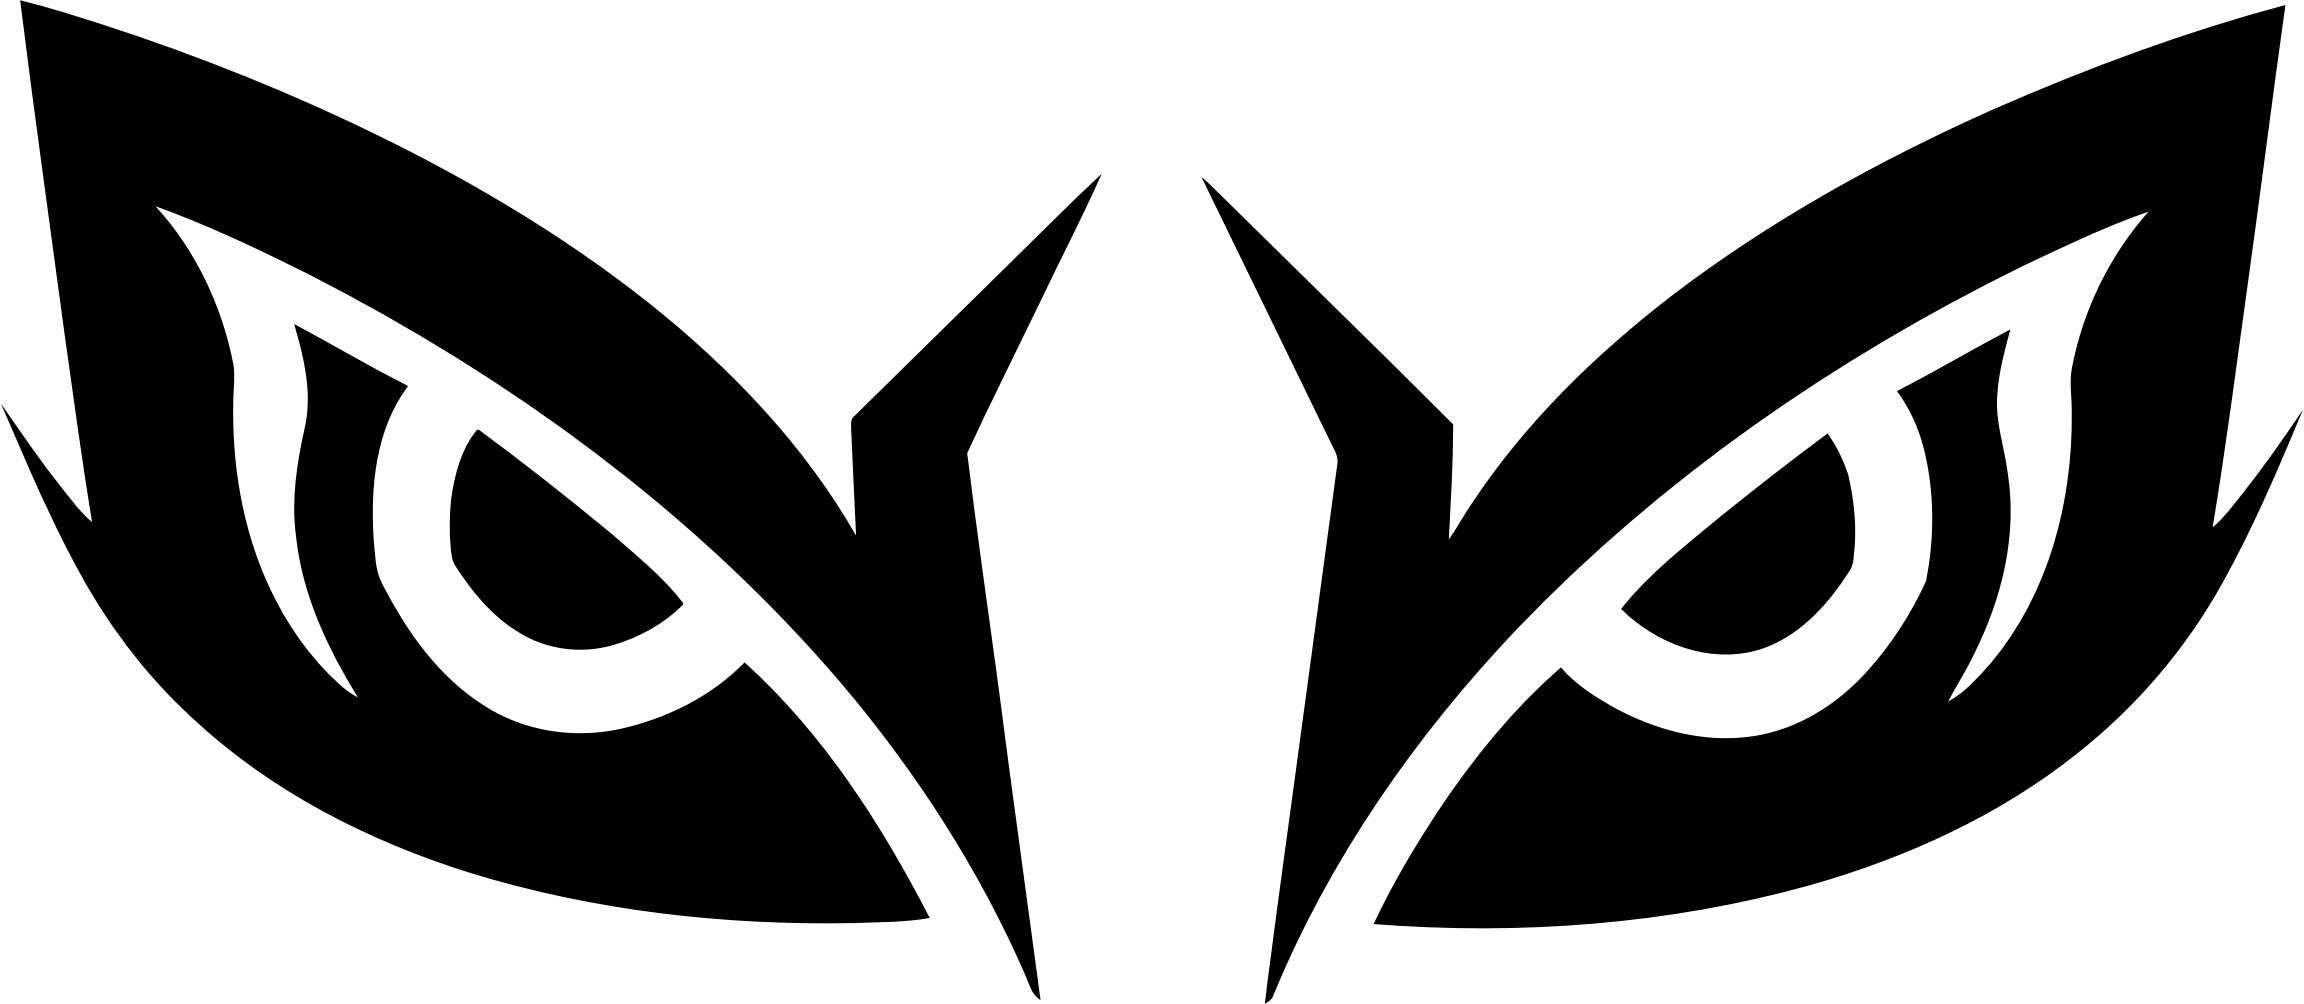 2304x1004 Clipart